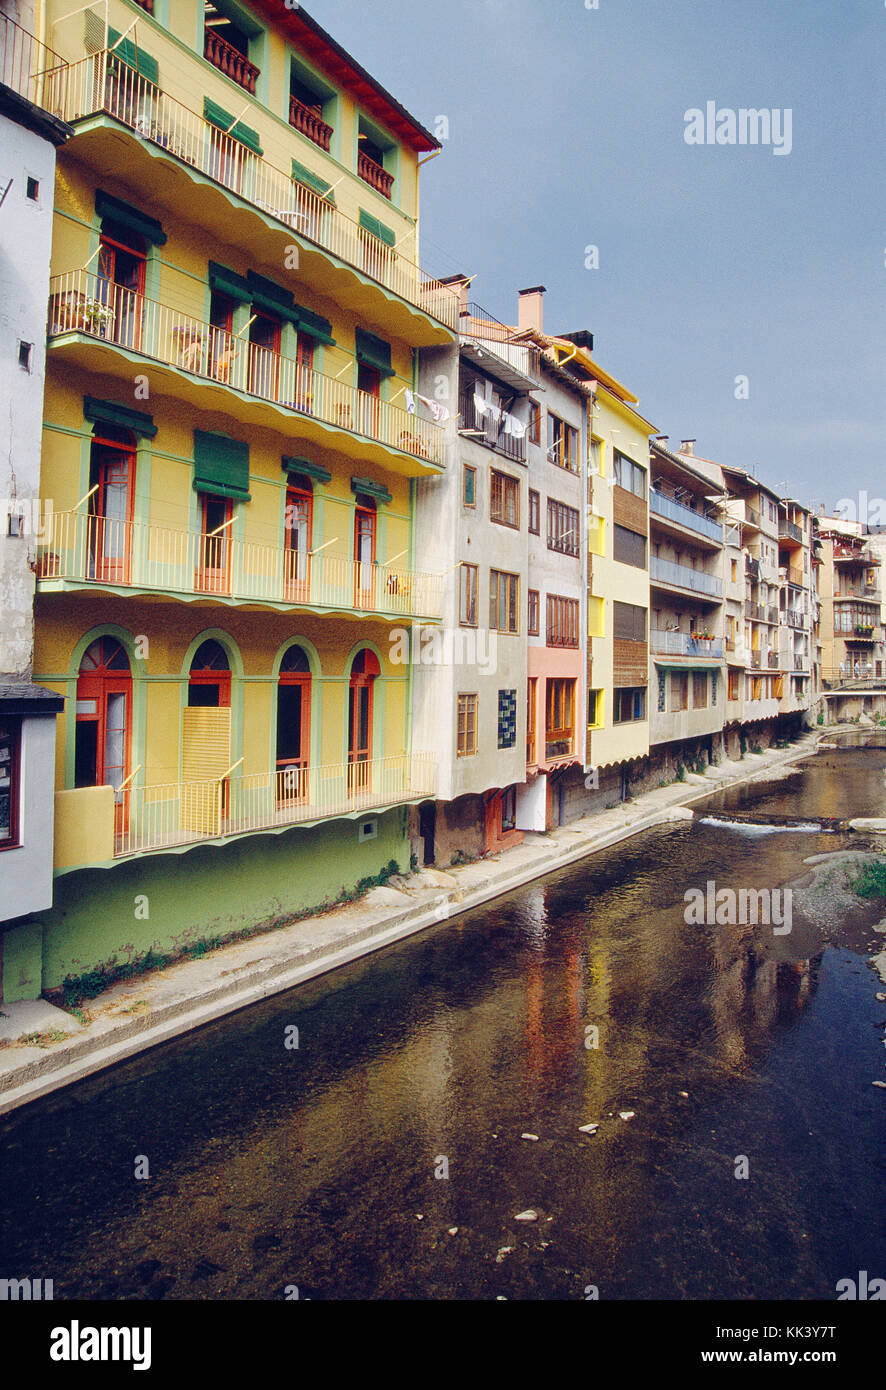 Coloridas fachadas y del río Ter. Camprodon, provincia de Girona, Cataluña, España. Imagen De Stock